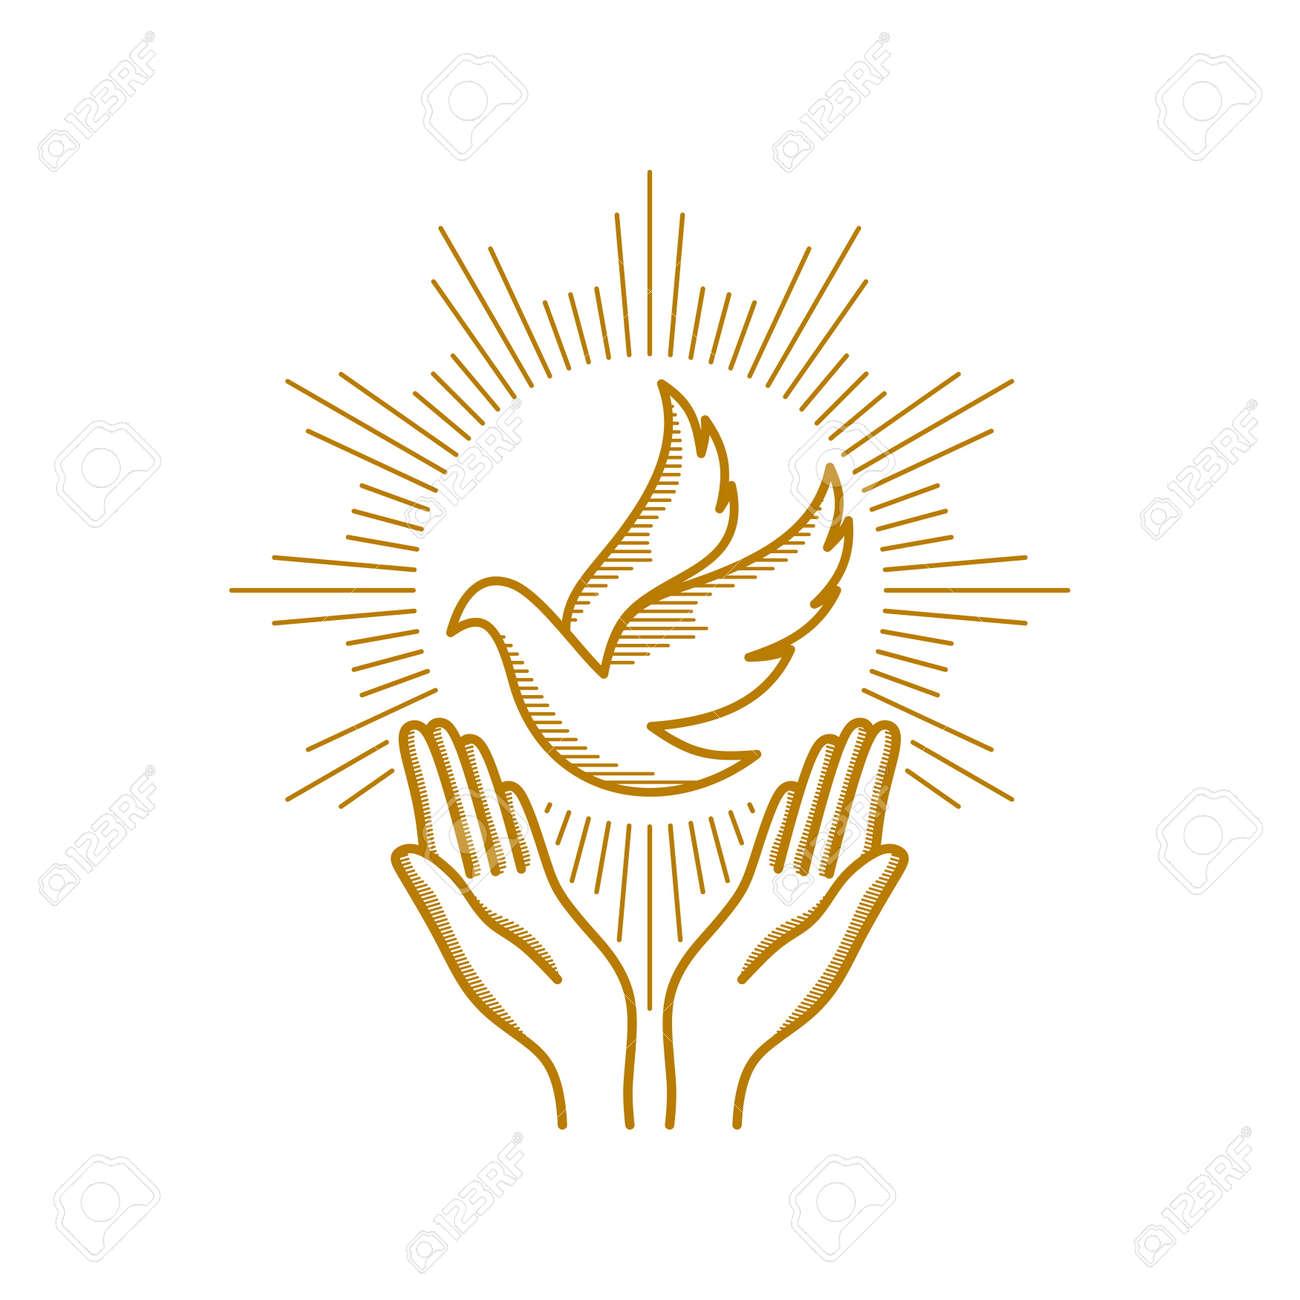 Church logo. Christian symbols. Praying hands and dove - a symbol of the Holy Spirit. - 113695507